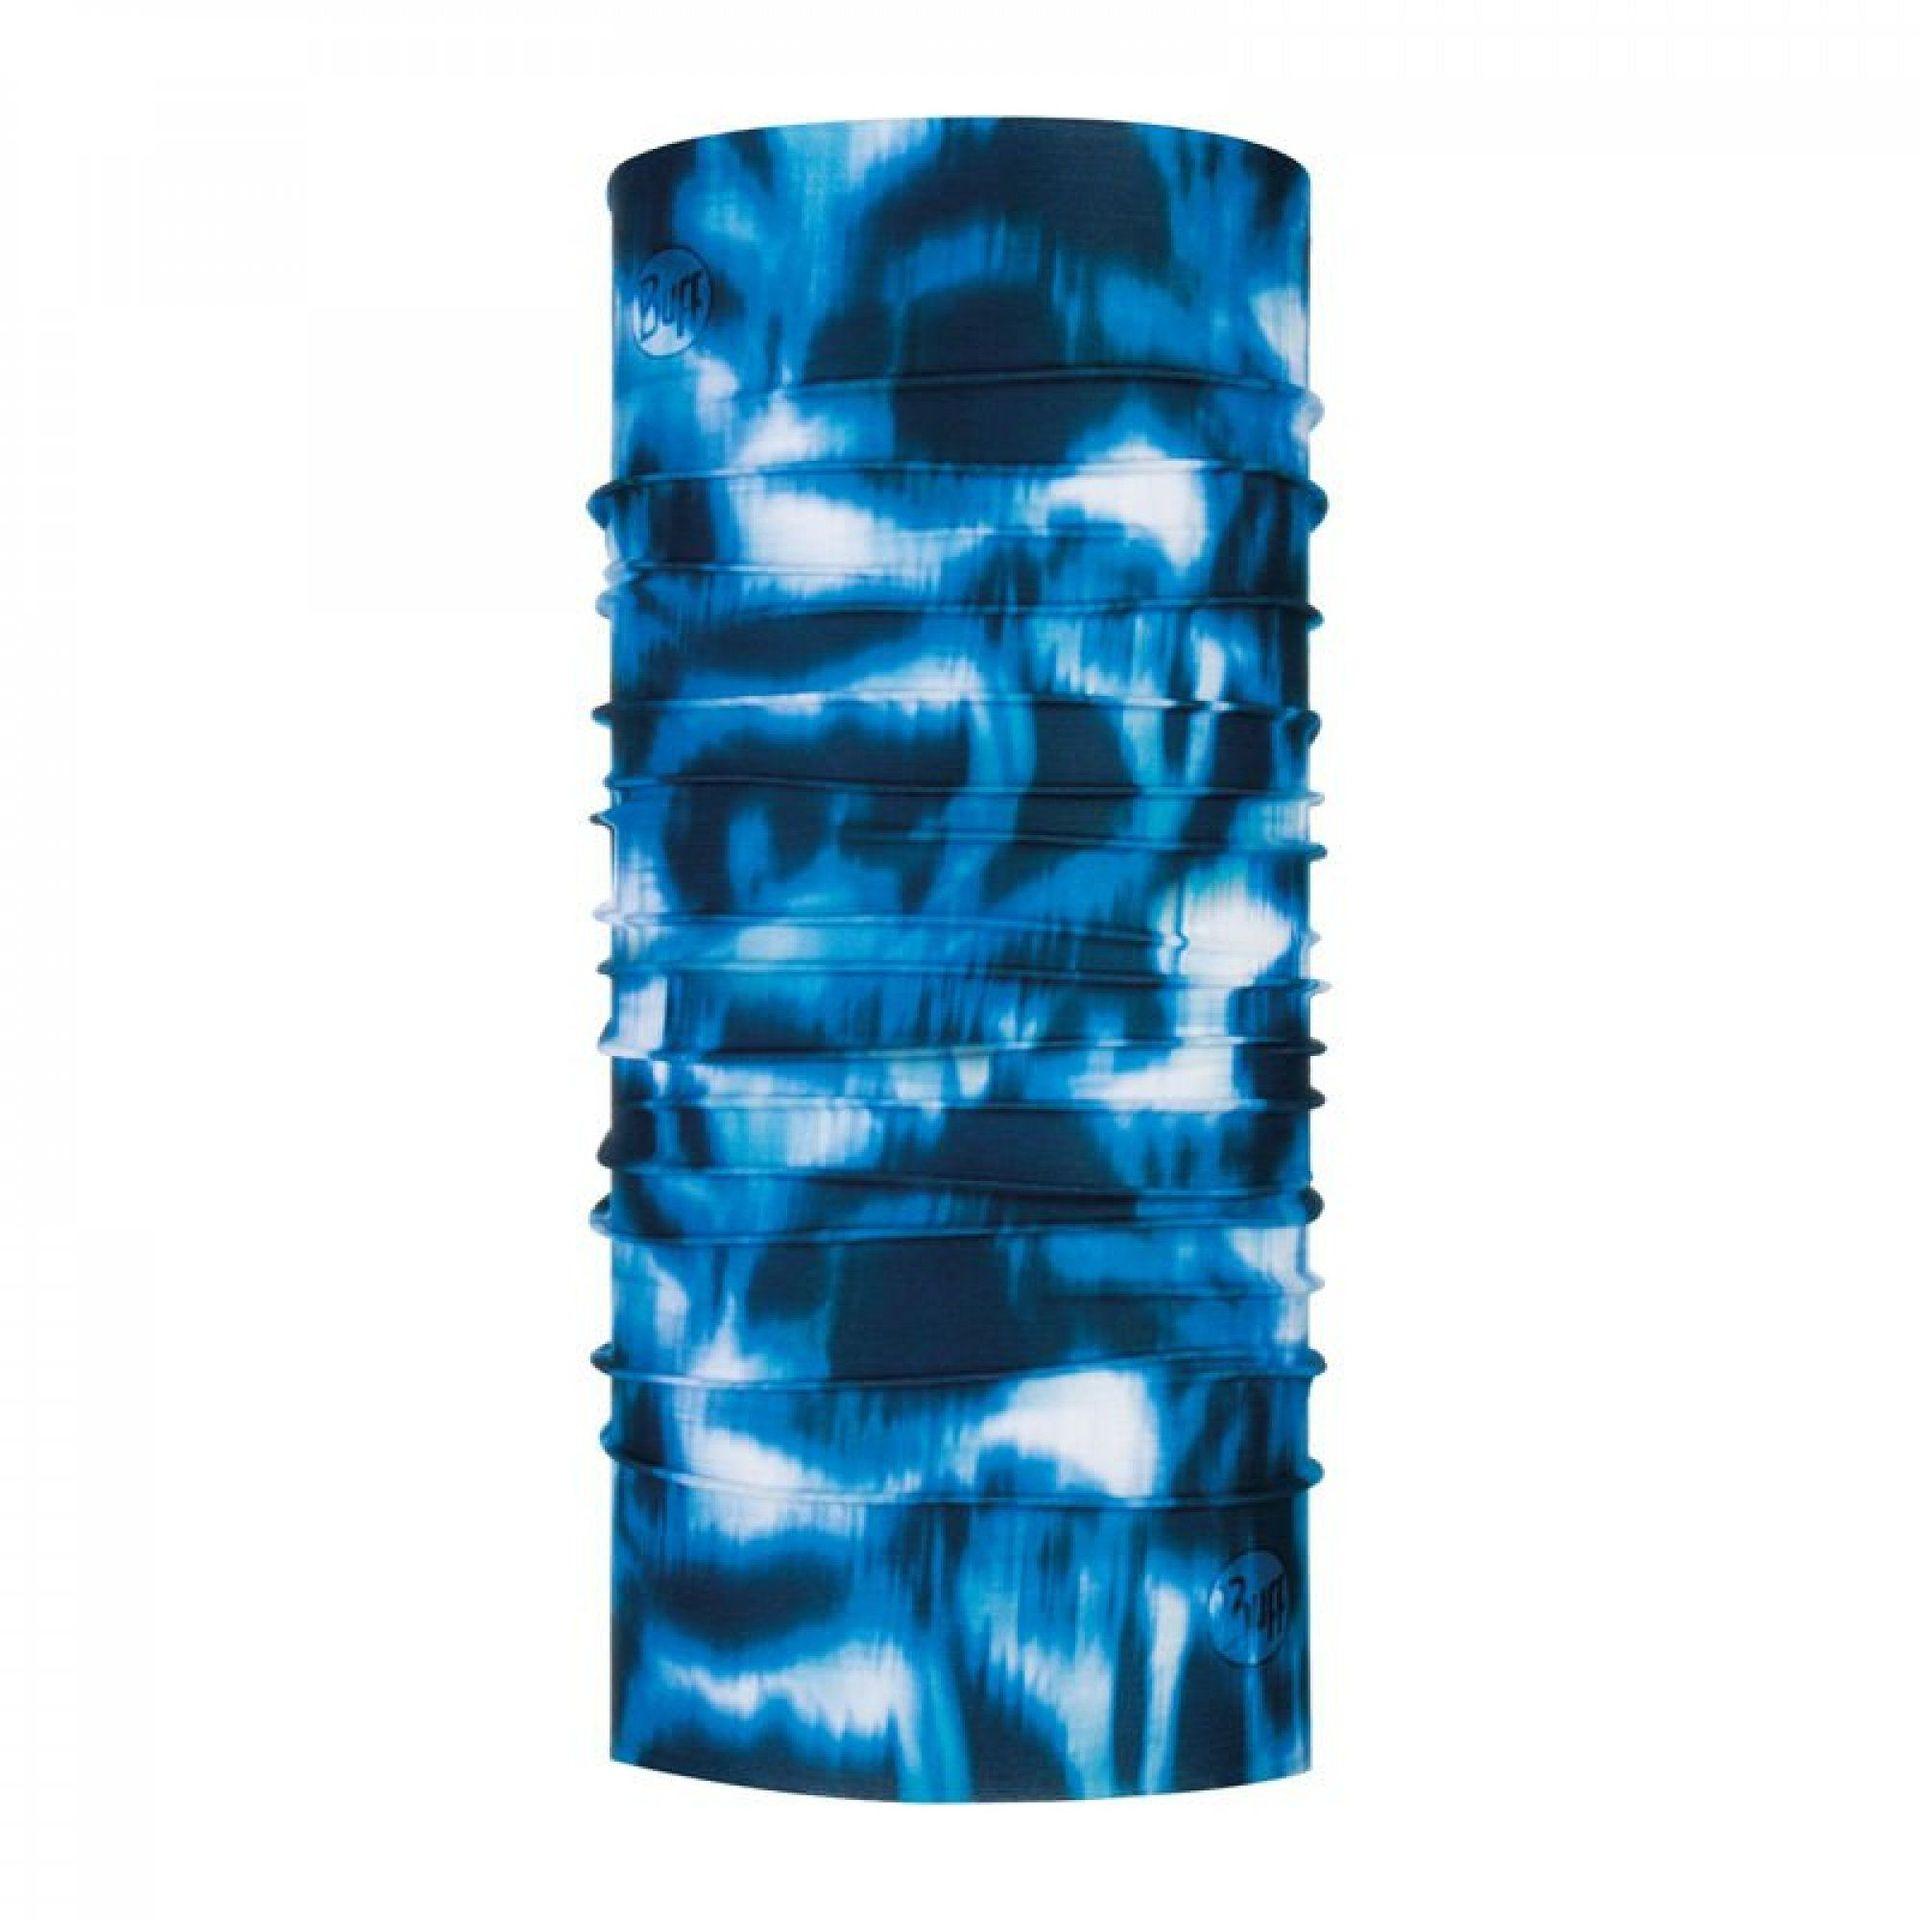 CHUSTA COOLNET UV+ YULE SEAPORT BLUE